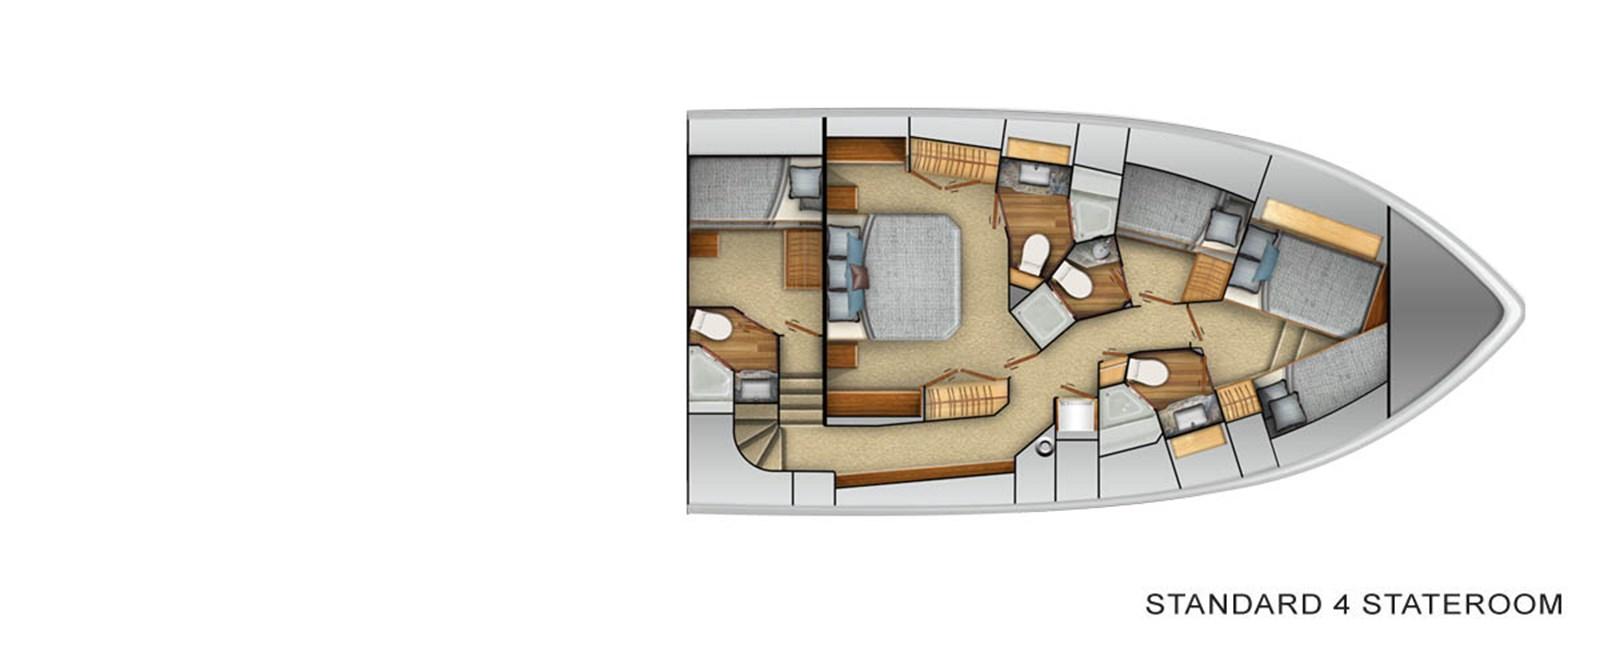 Stateroom Layout 2021 VIKING Enclosed Bridge Sport Fisherman 2926357